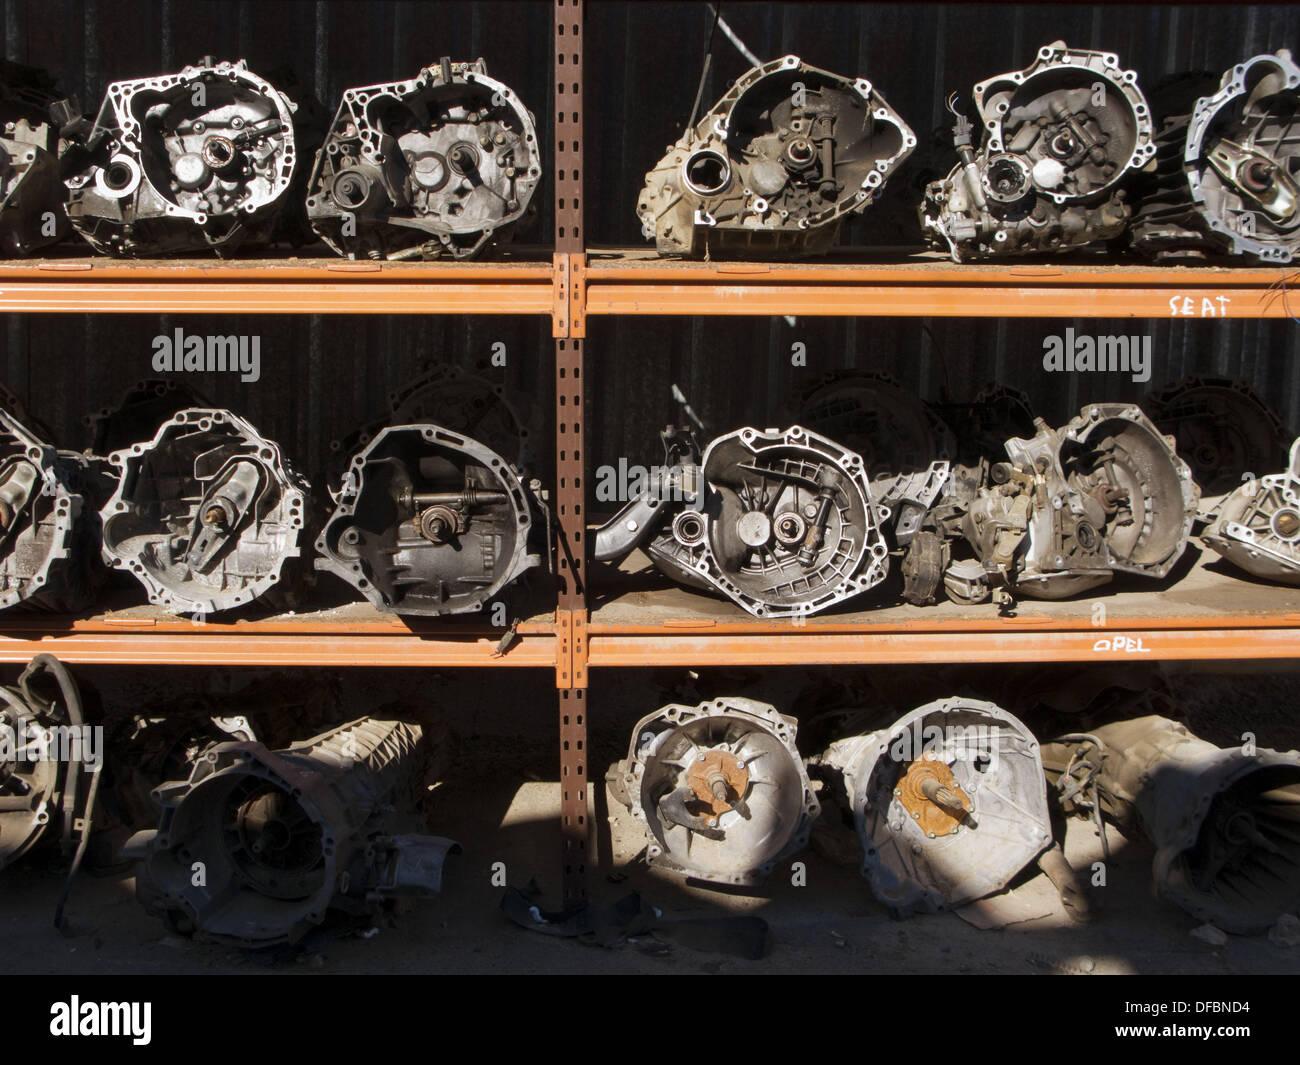 Storage warehouse in Seville, Spain. - Stock Image